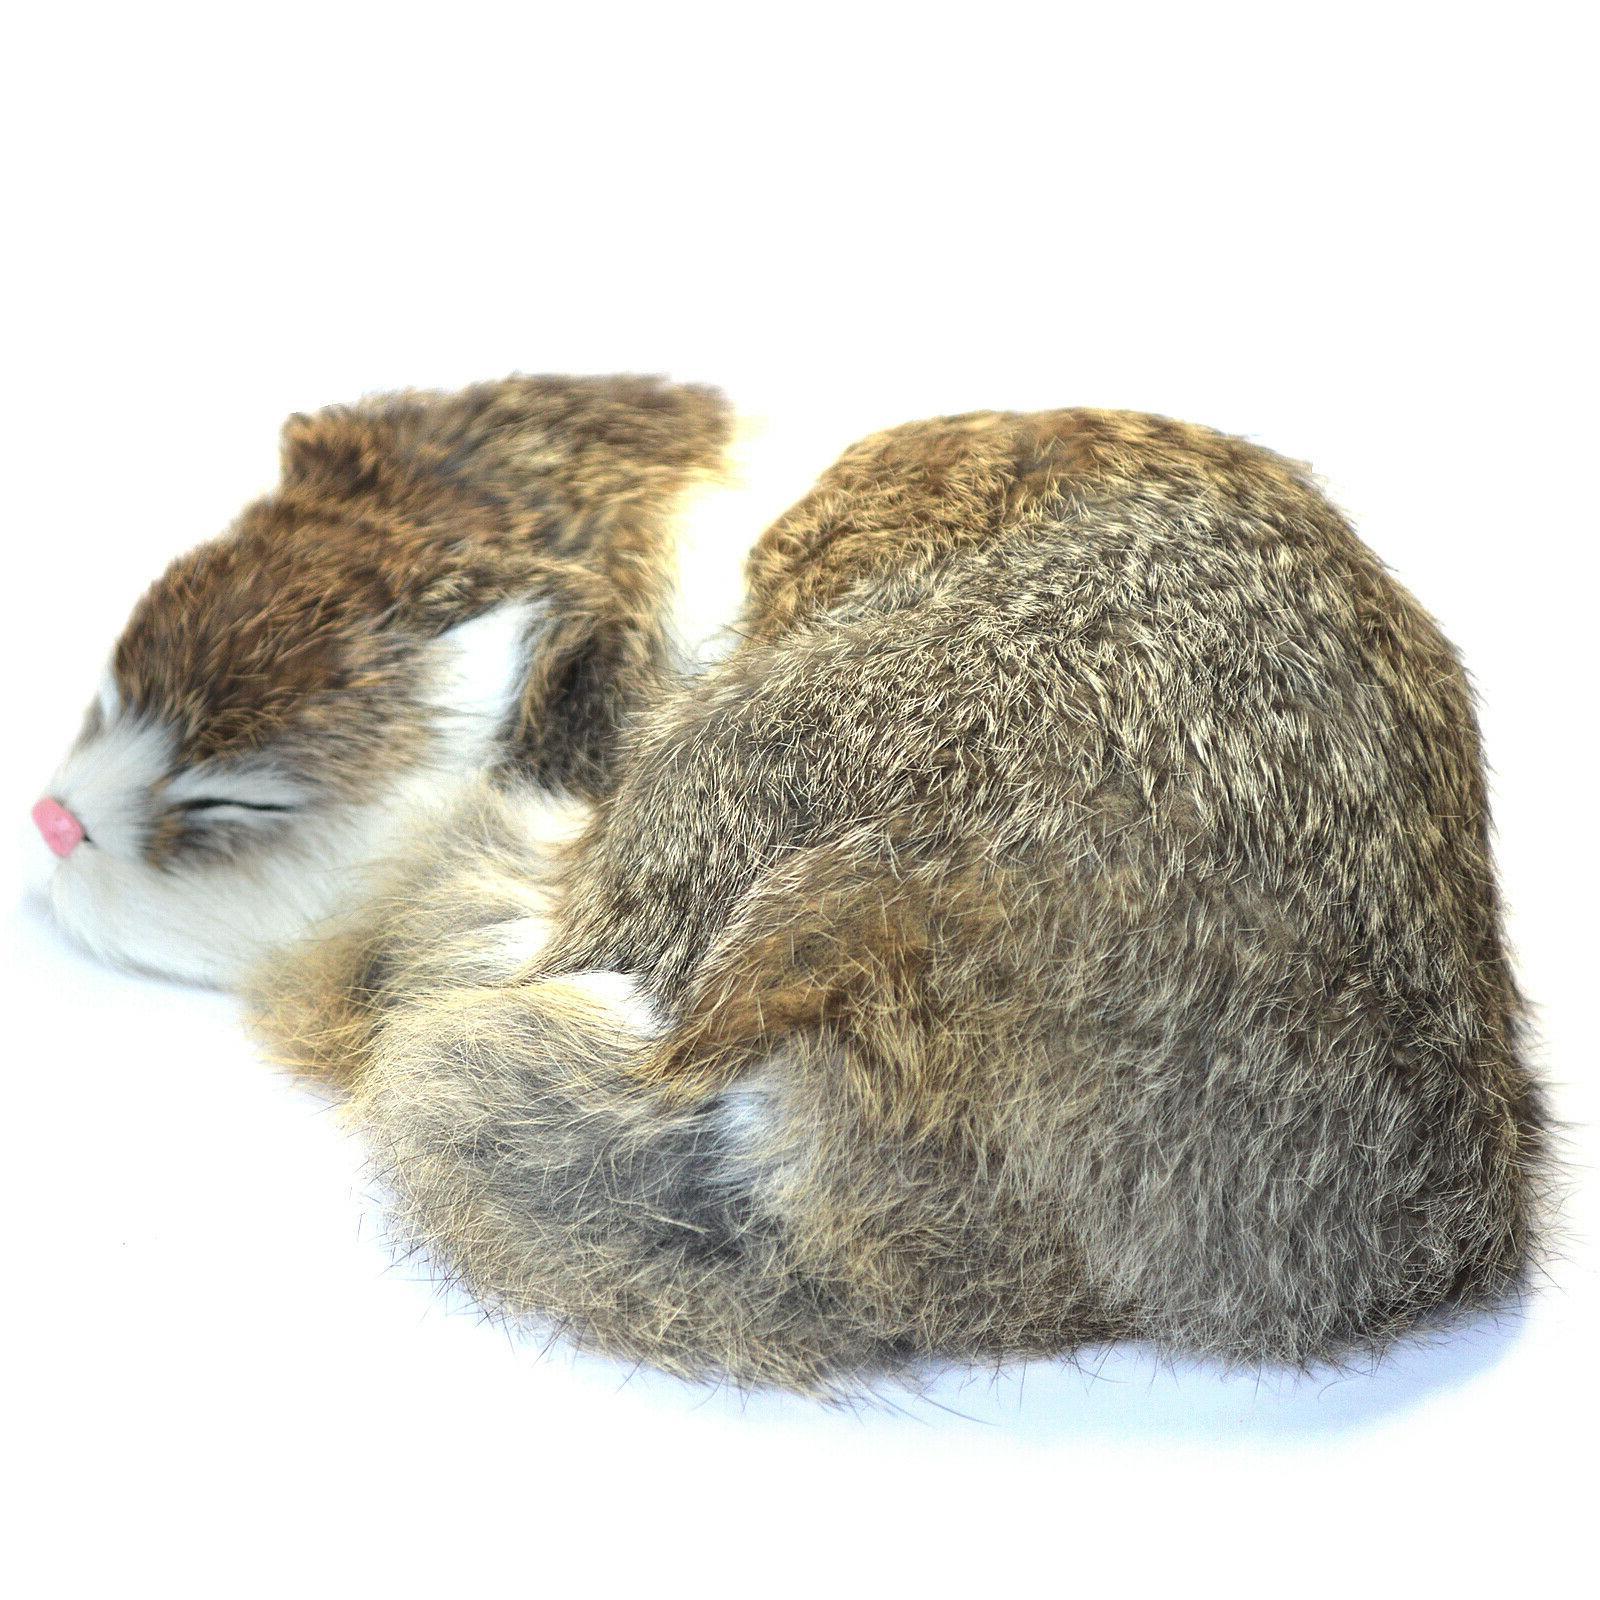 Realistic Lifelike Plush Soft Animal Sleeping